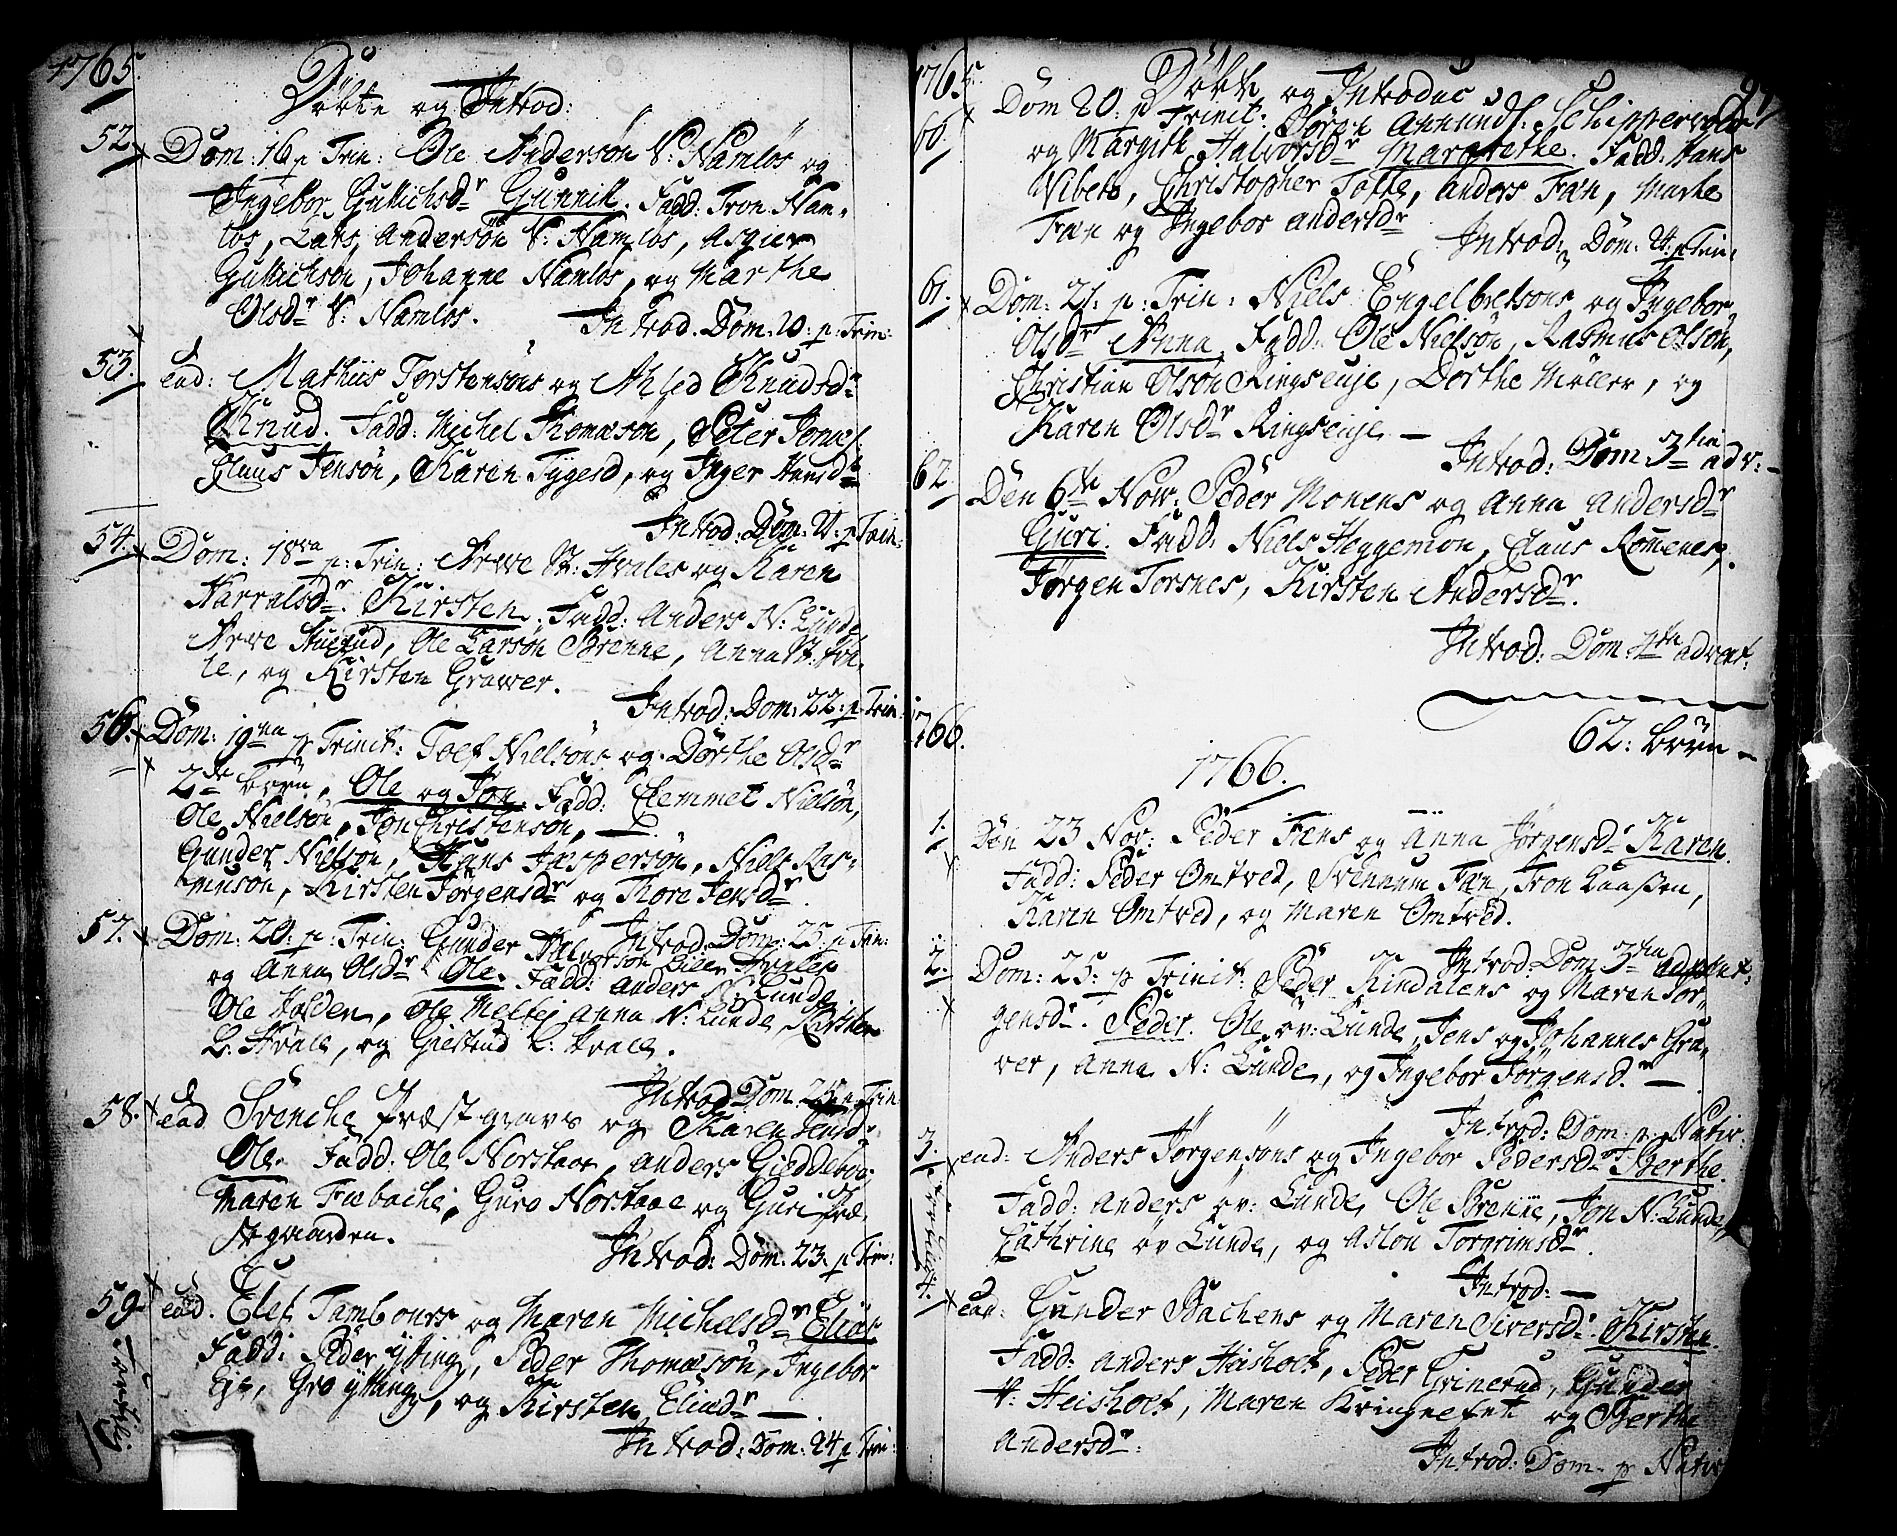 SAKO, Holla kirkebøker, F/Fa/L0001: Ministerialbok nr. 1, 1717-1779, s. 99